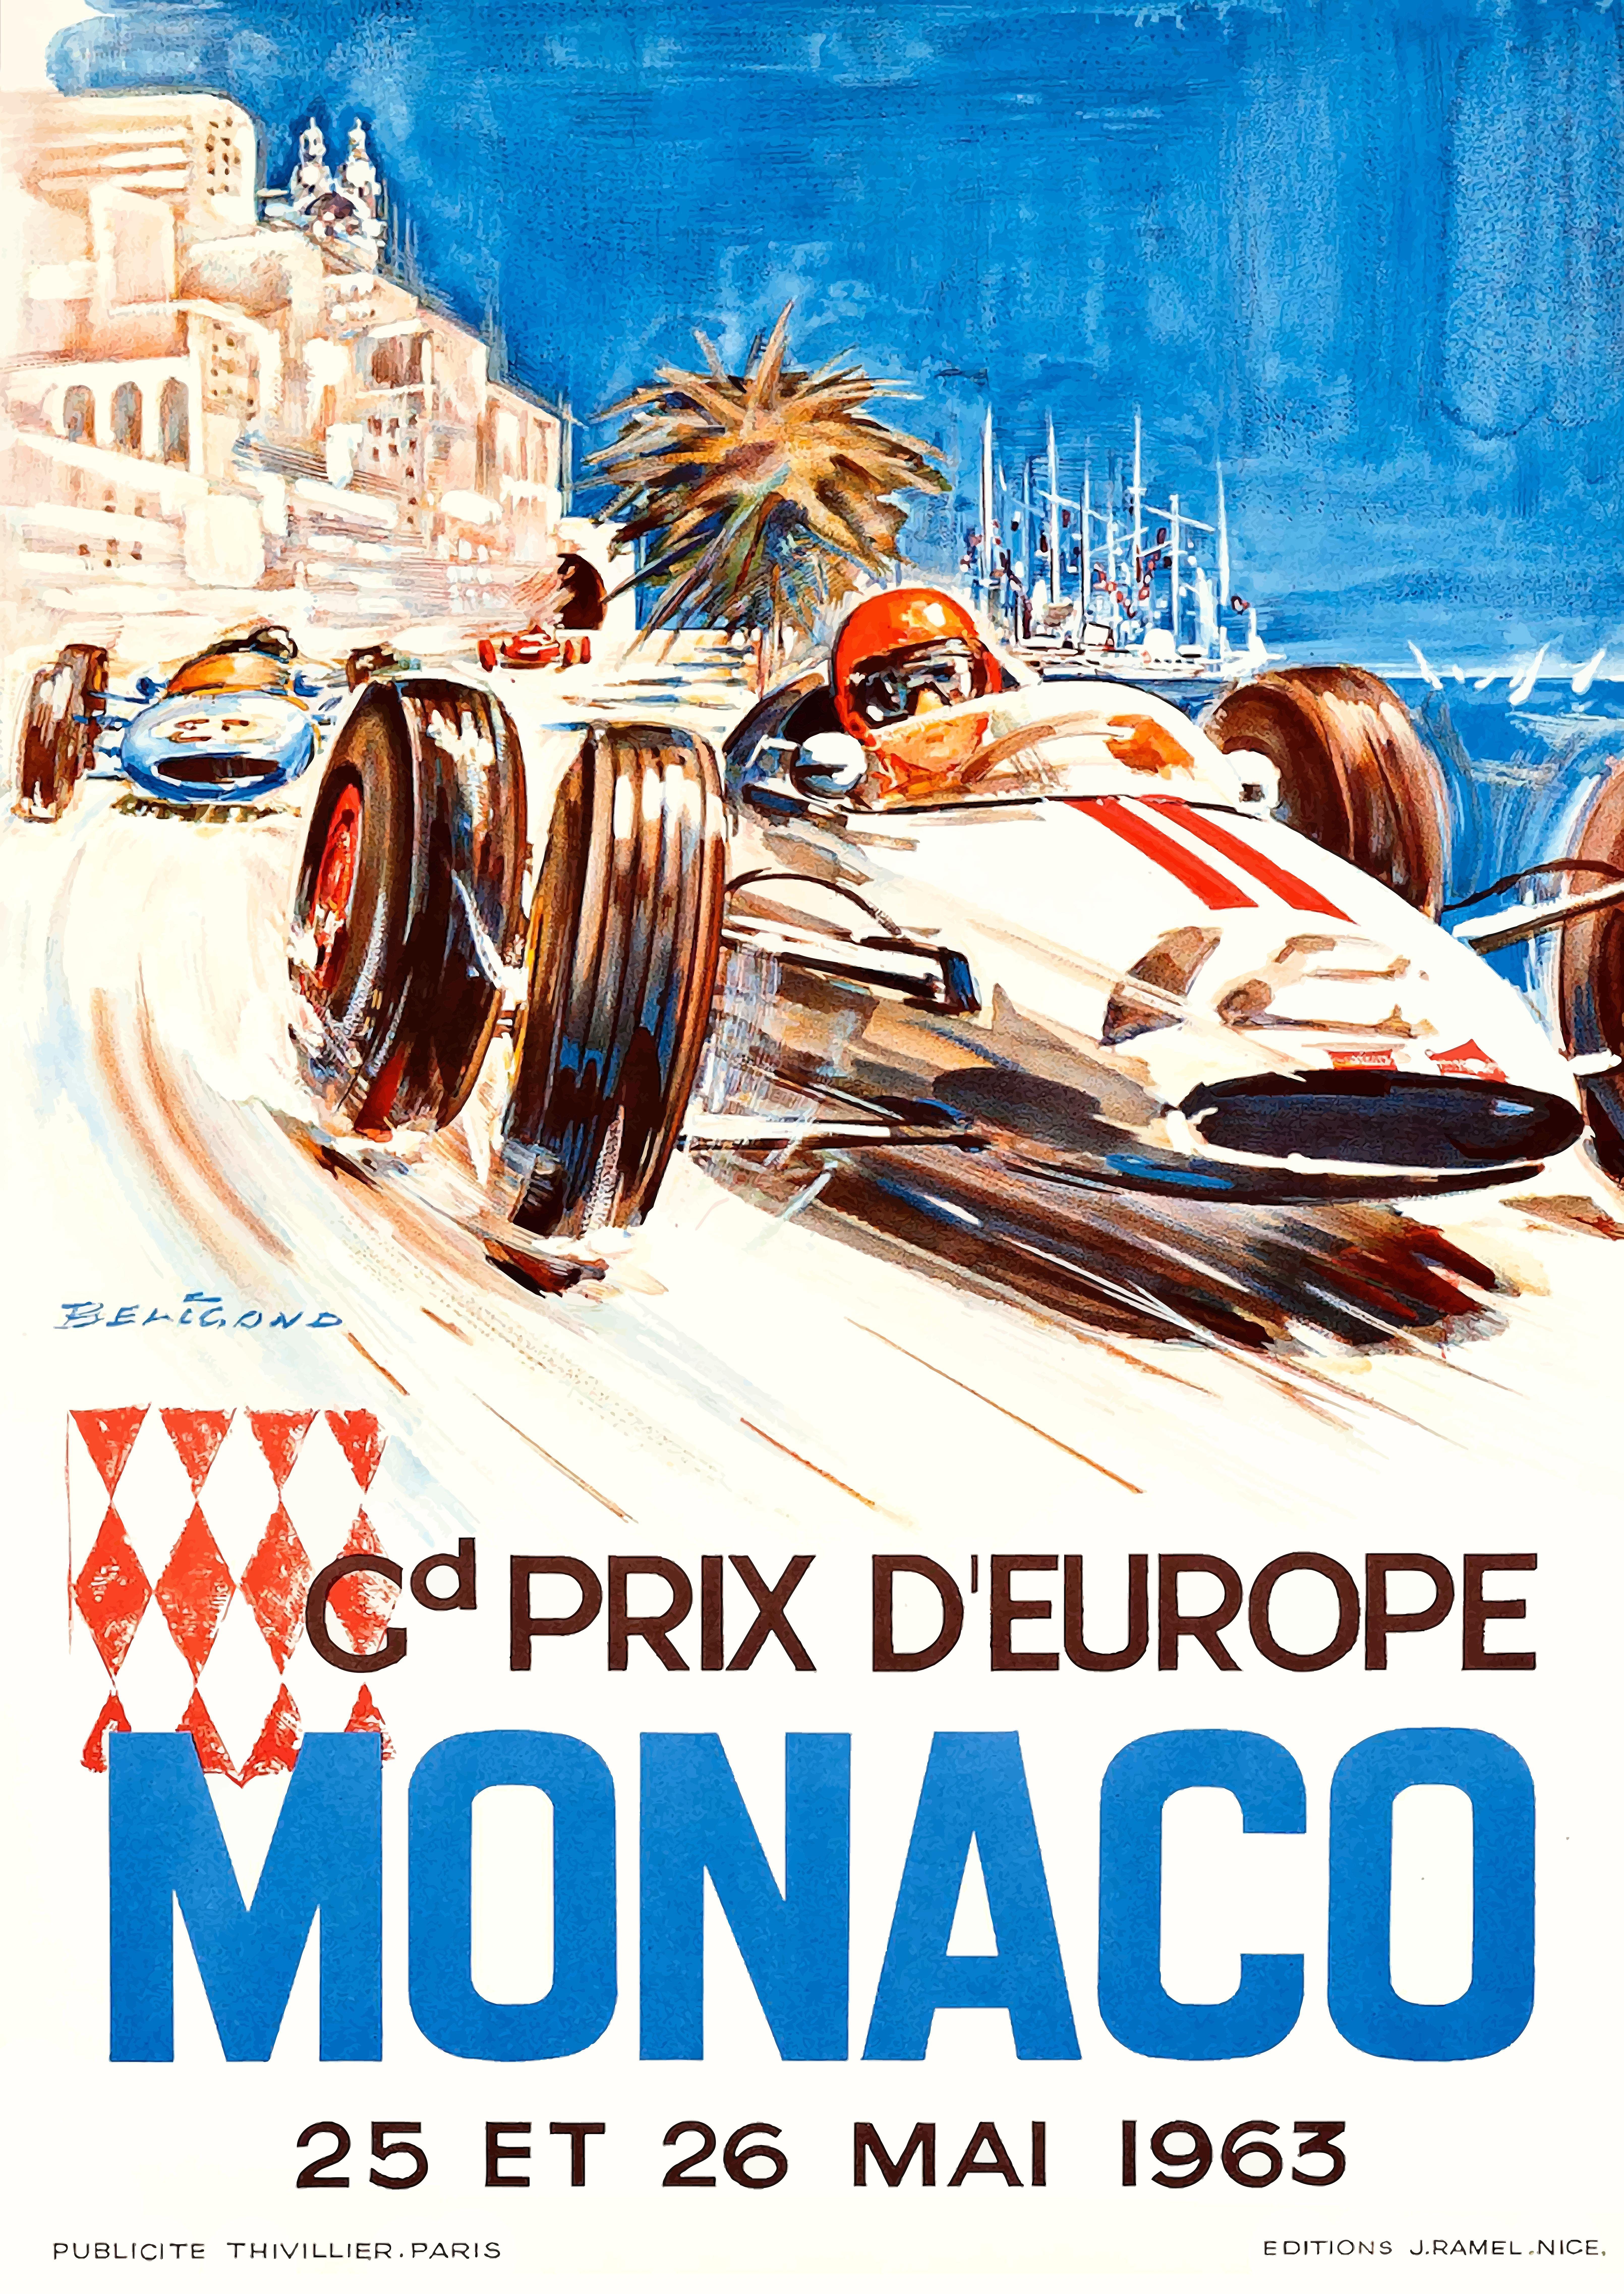 1963 Monaco Grand Prix Racing Poster By Retro Graphics With